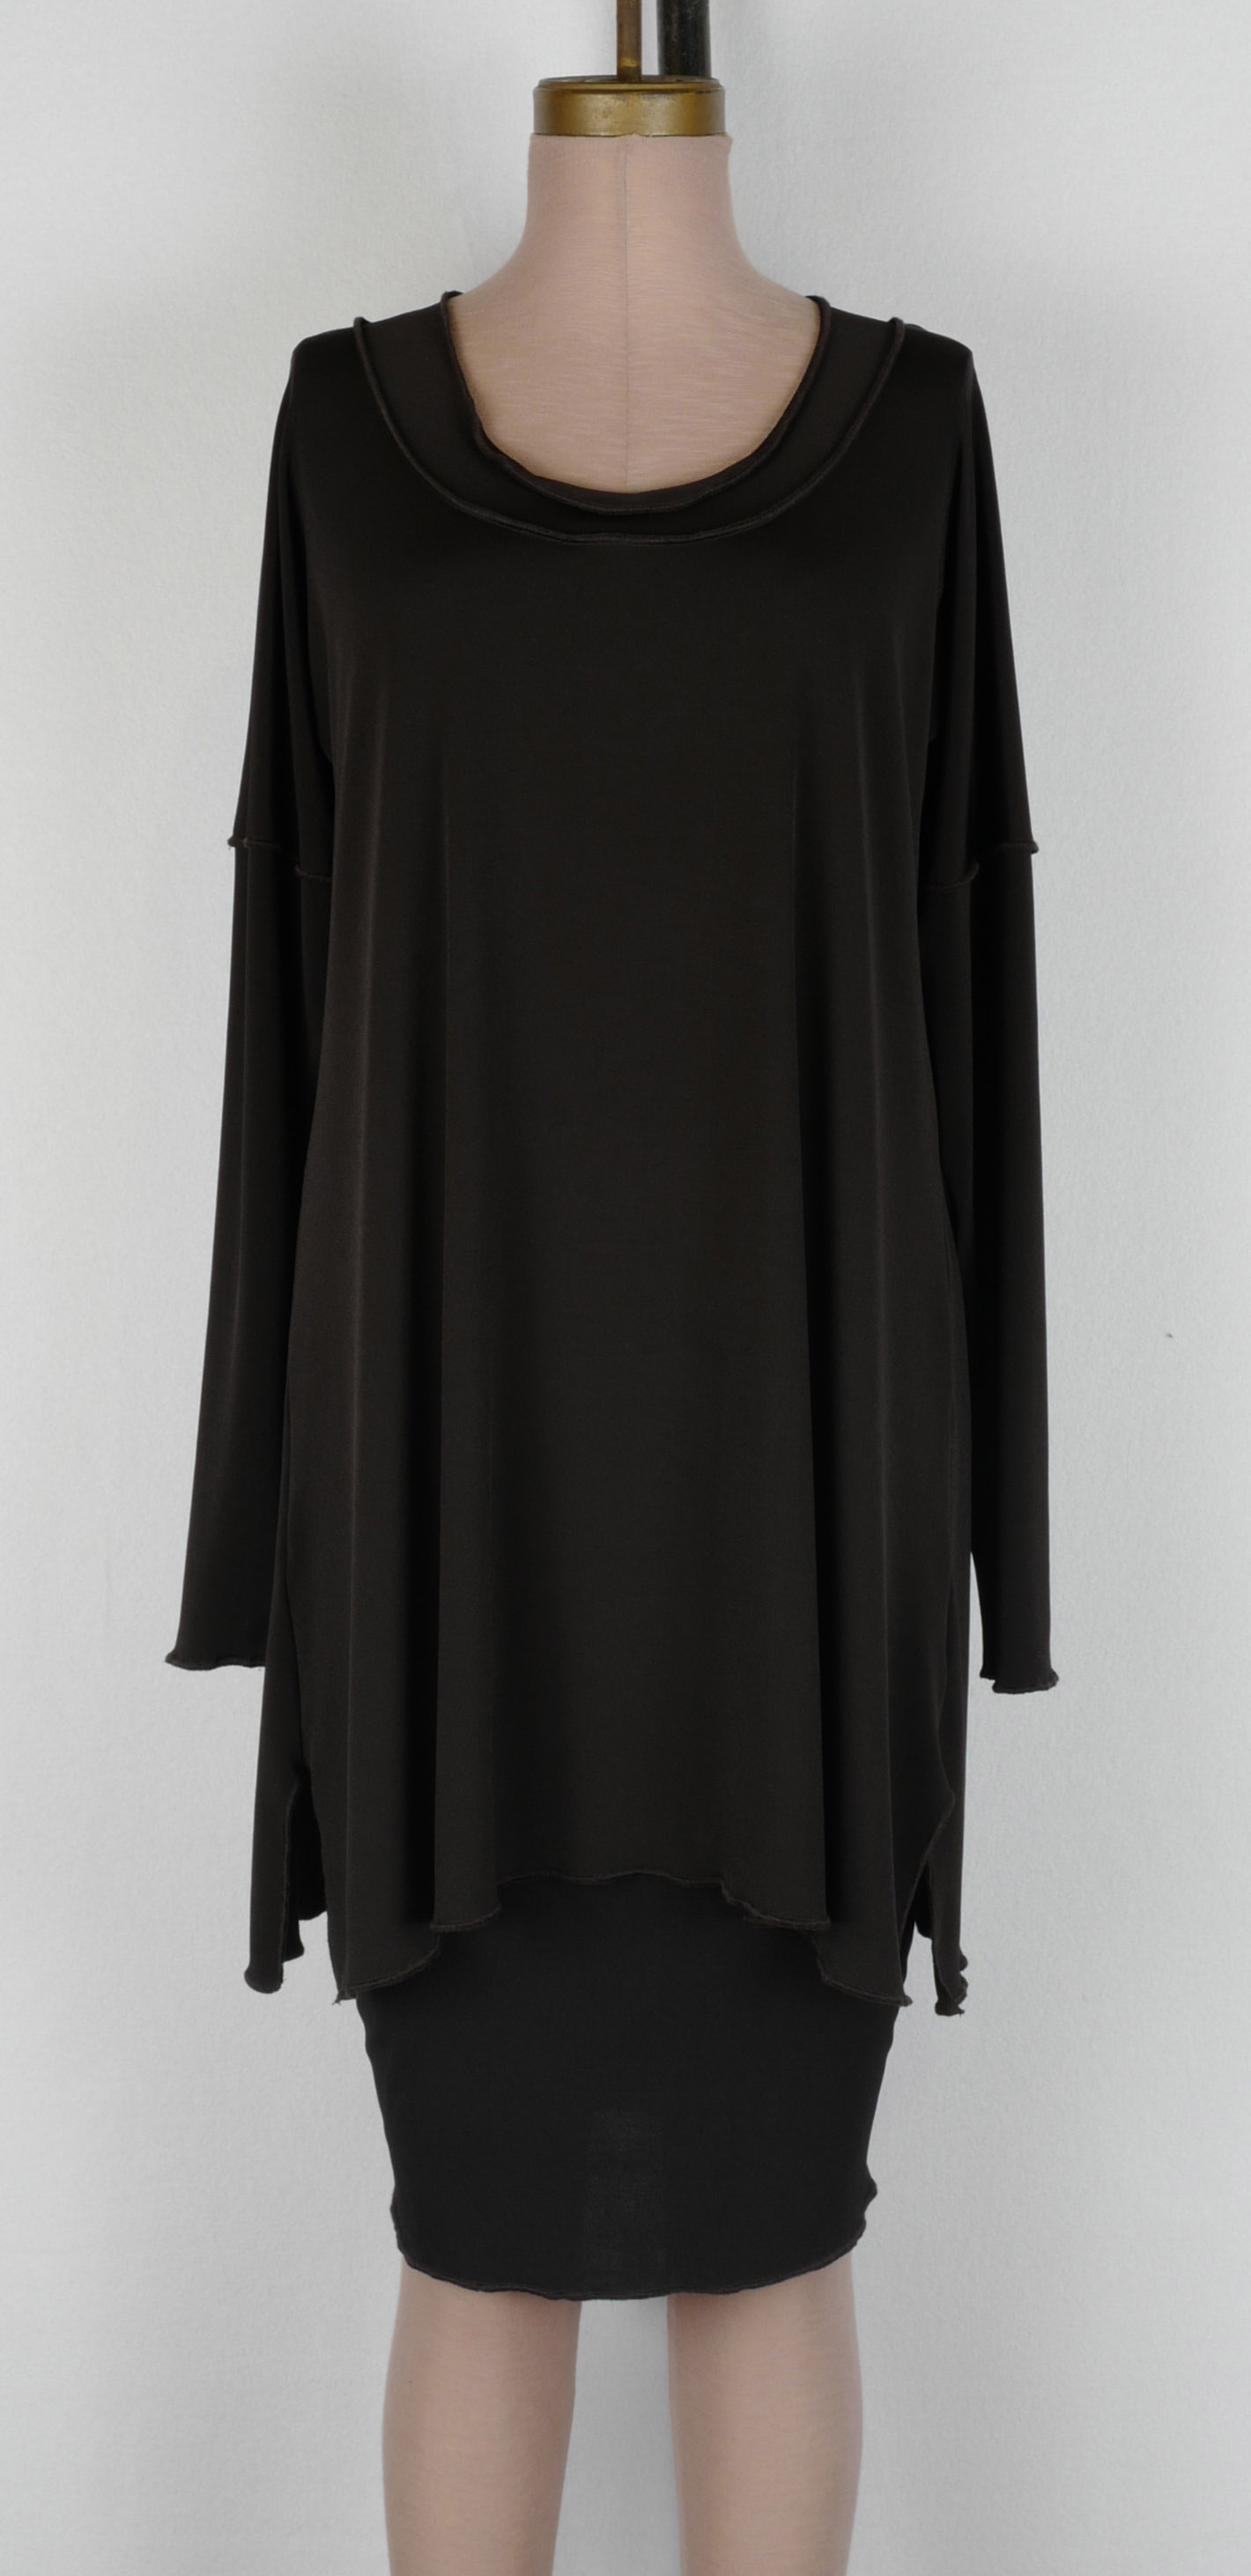 Long Sleeved Hybrid $110 • S M L XL